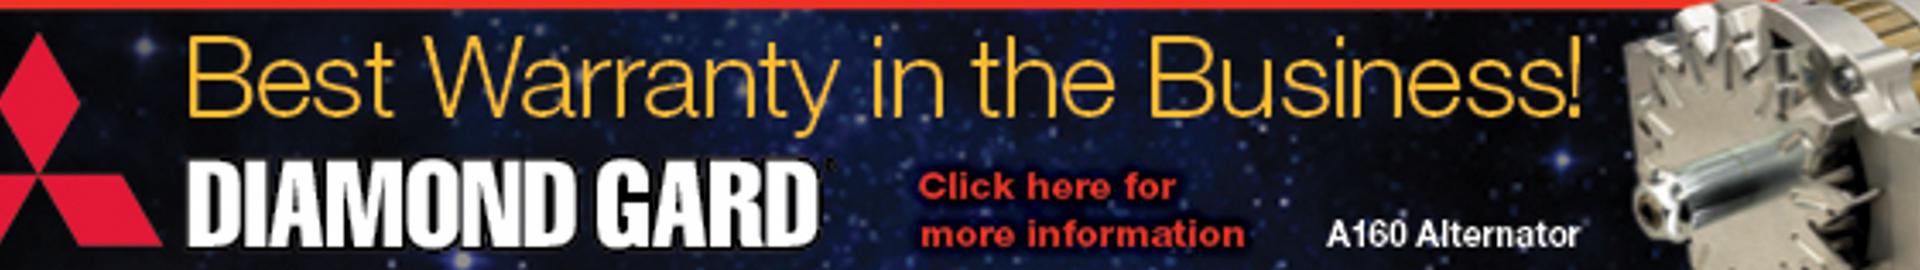 Digital Banner Advertisement - Commercial Truck - b